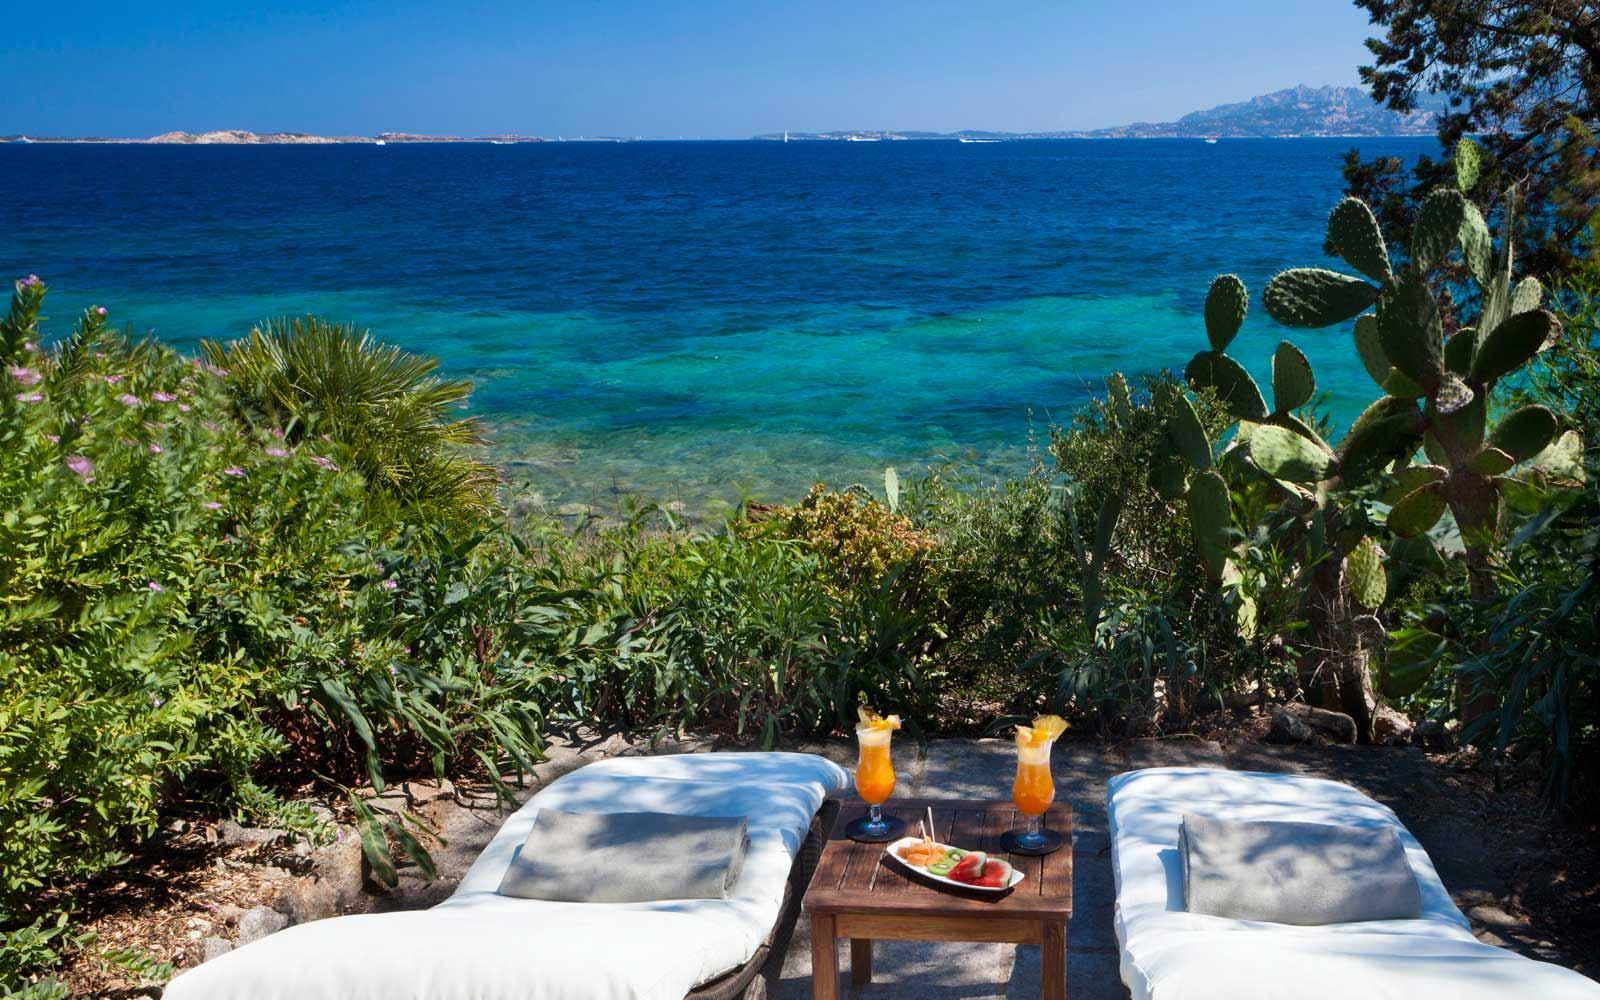 Sun loungers at Hotel Capo D'Orso Thalasso & Spa